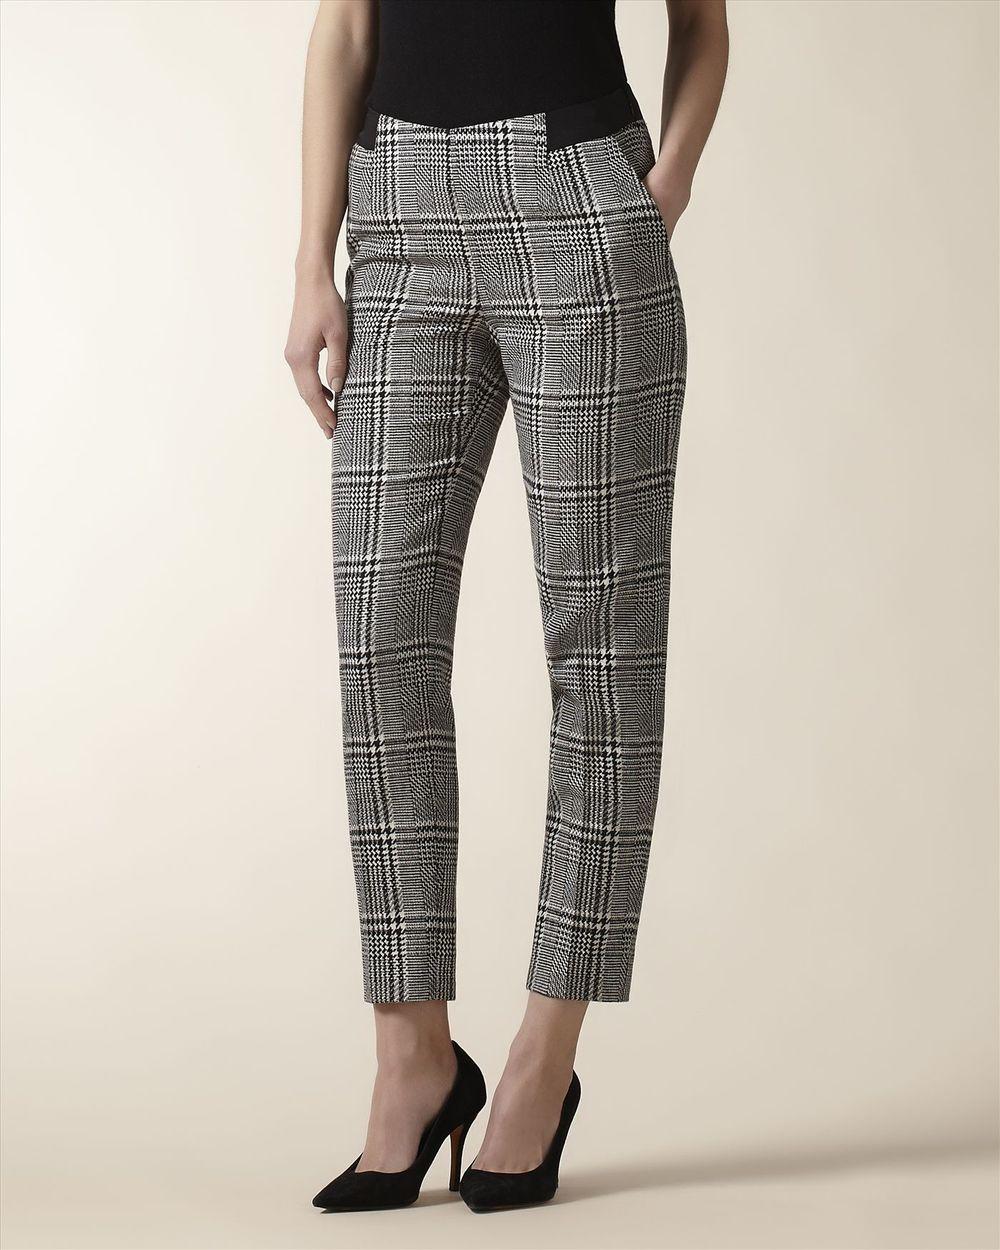 Wool Fashion Formal Girls Pants - Buy Girls Pants,Wool Pants,Fashion Pants  Product on Alibaba.com